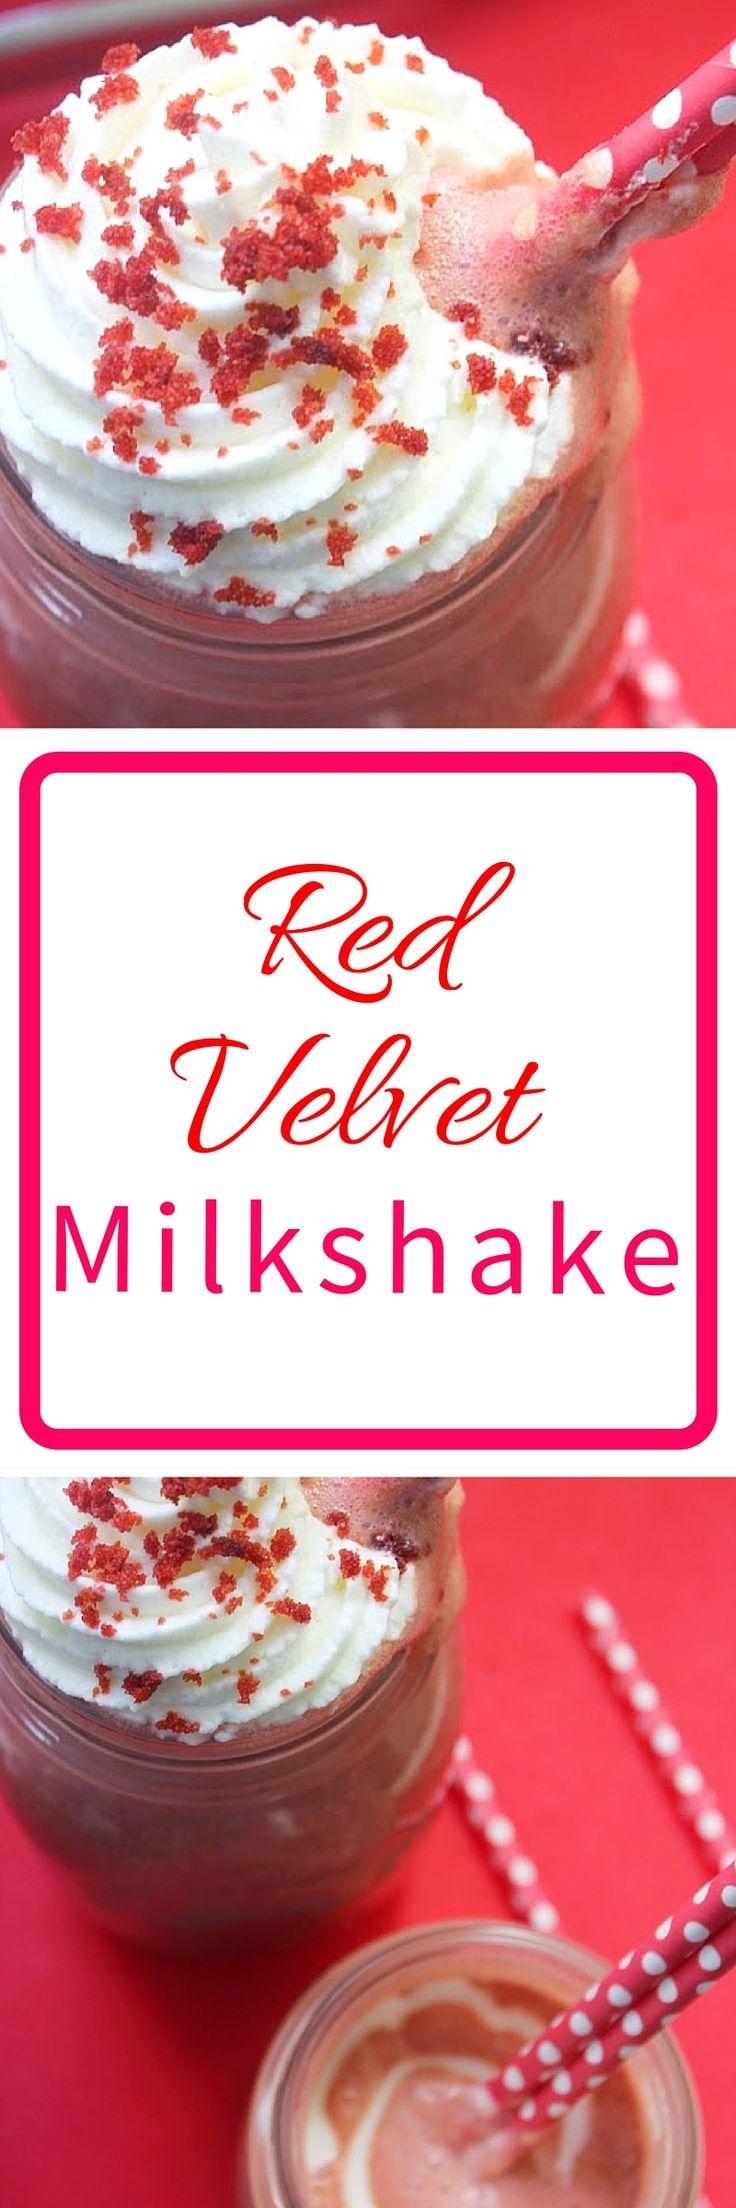 Red Velvet Milkshae recipe made with actual red velvet cake! Recipe from FlavoursandFrosting.com